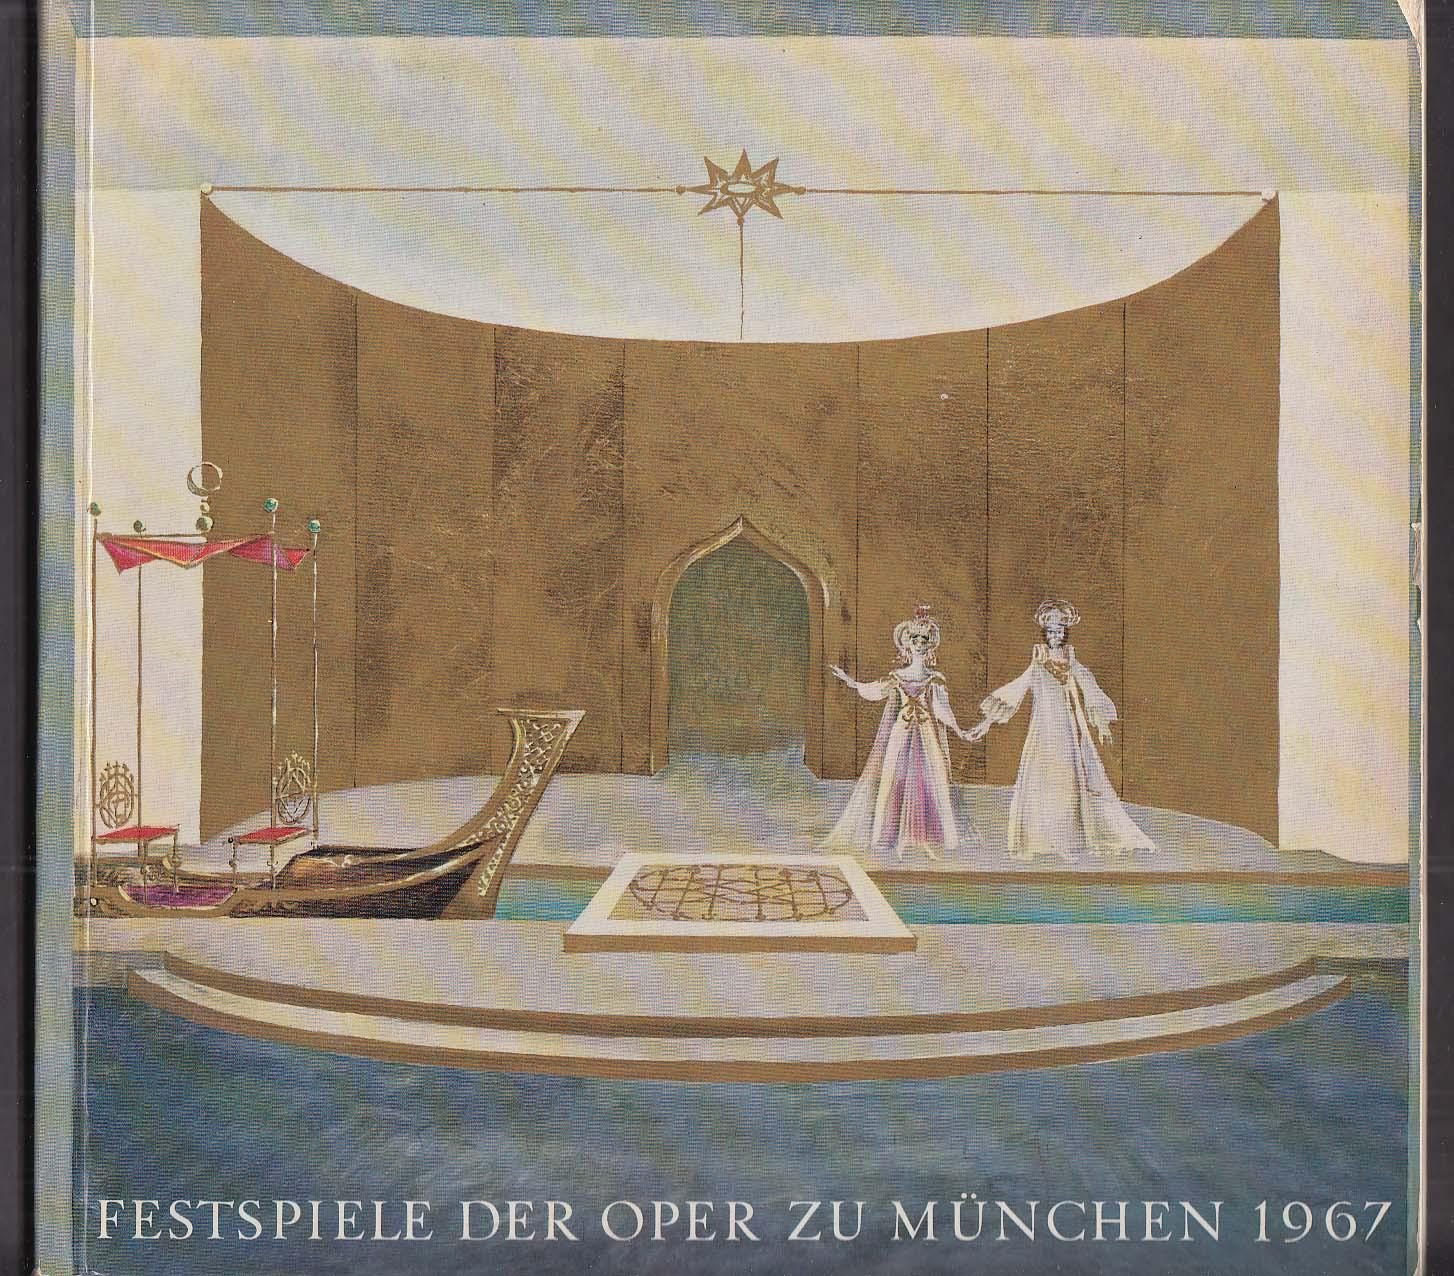 Munich Festival Muenchner Festspiel 1967 program